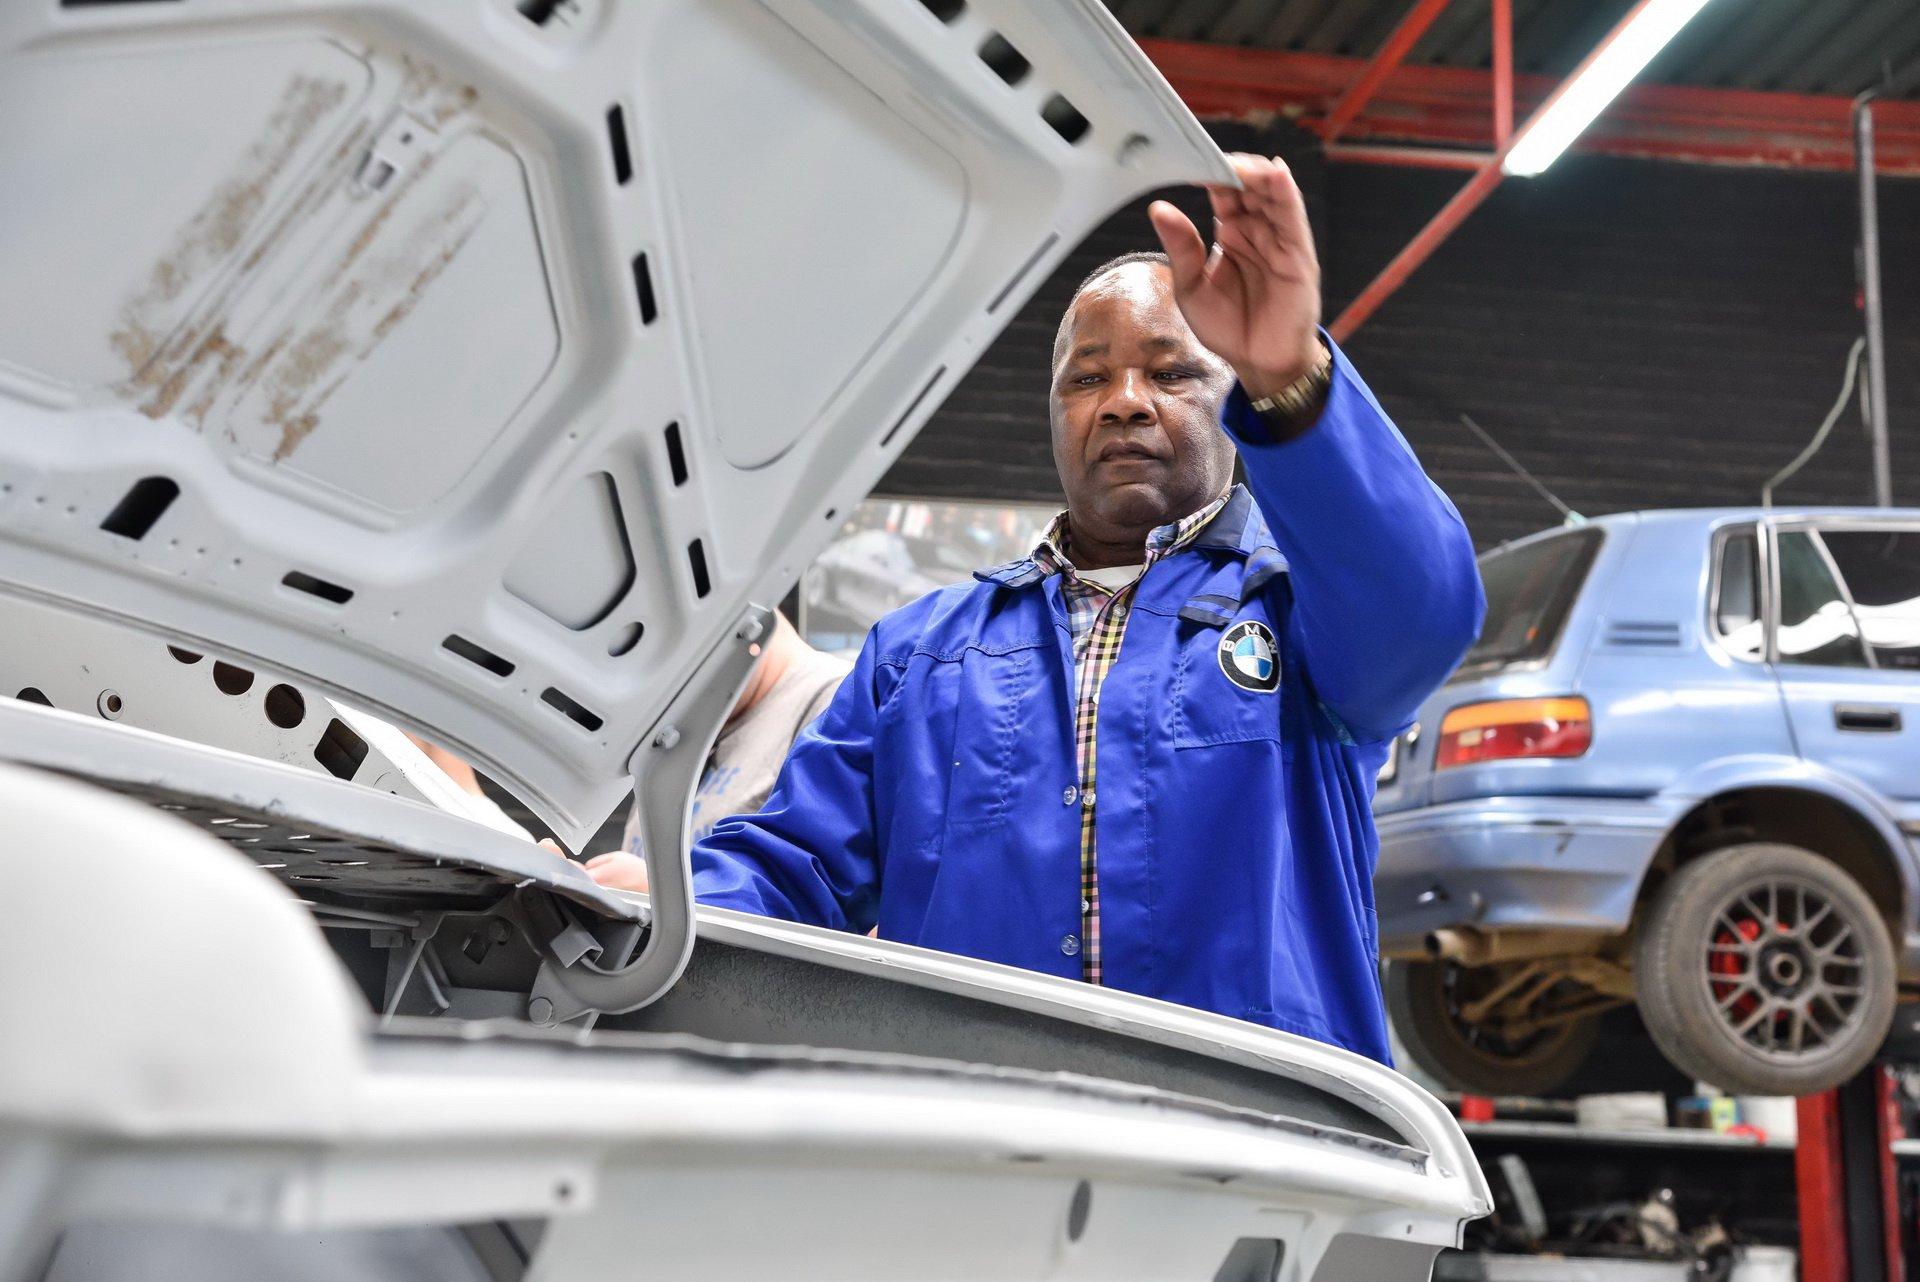 BMW-530-MLE-Restoration-process-97